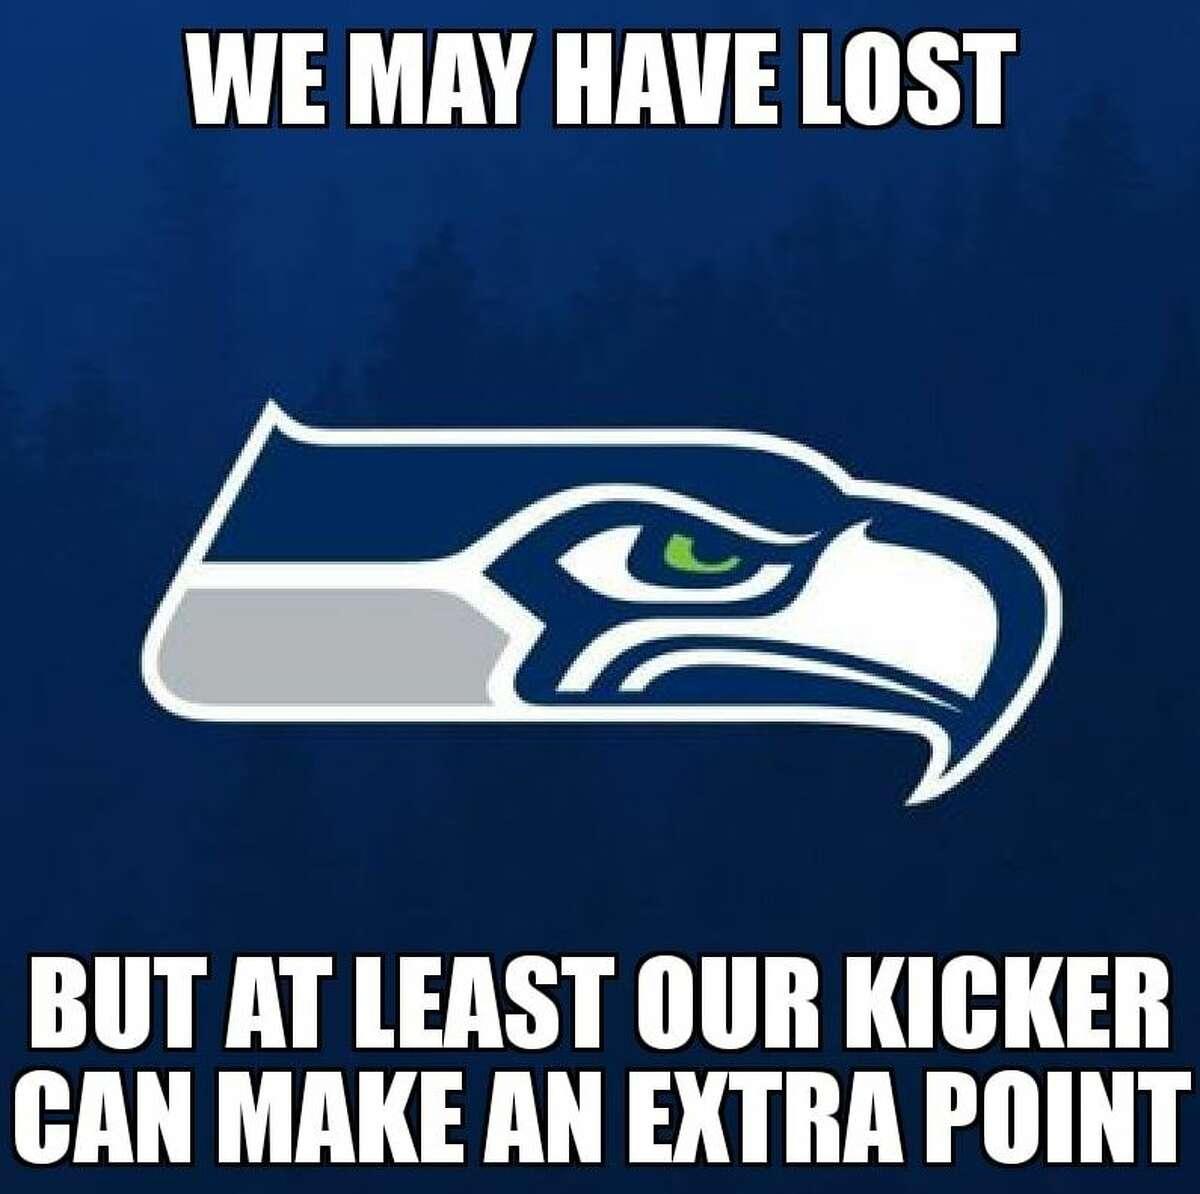 Source: Facebook.com/SeahawksMemes